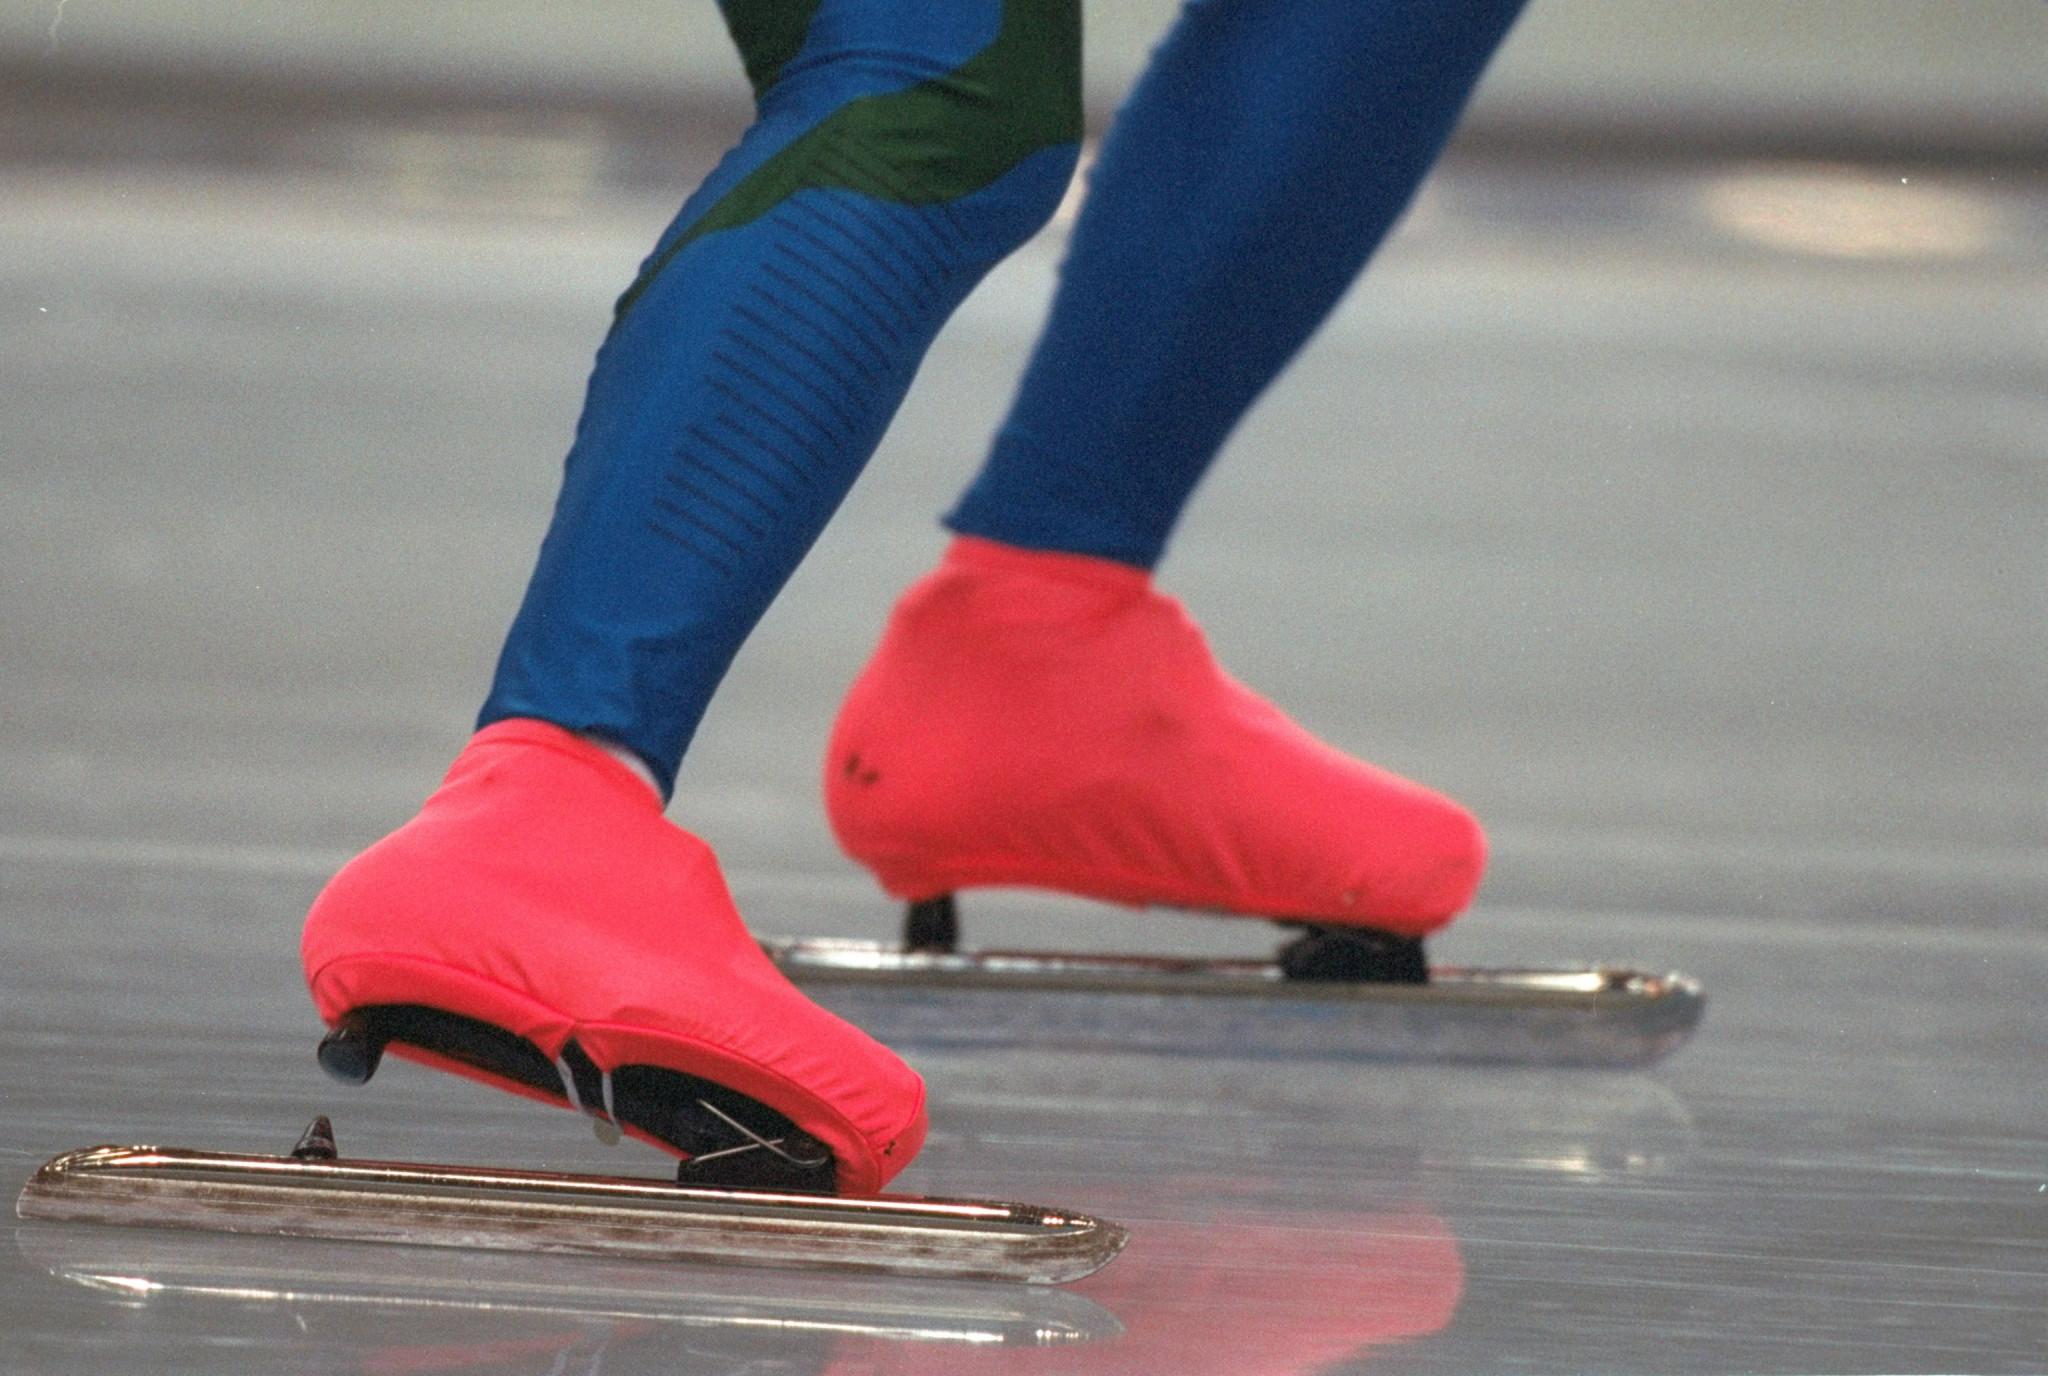 Six-time world speed skating champion Zhelezovsky dies of COVID-19